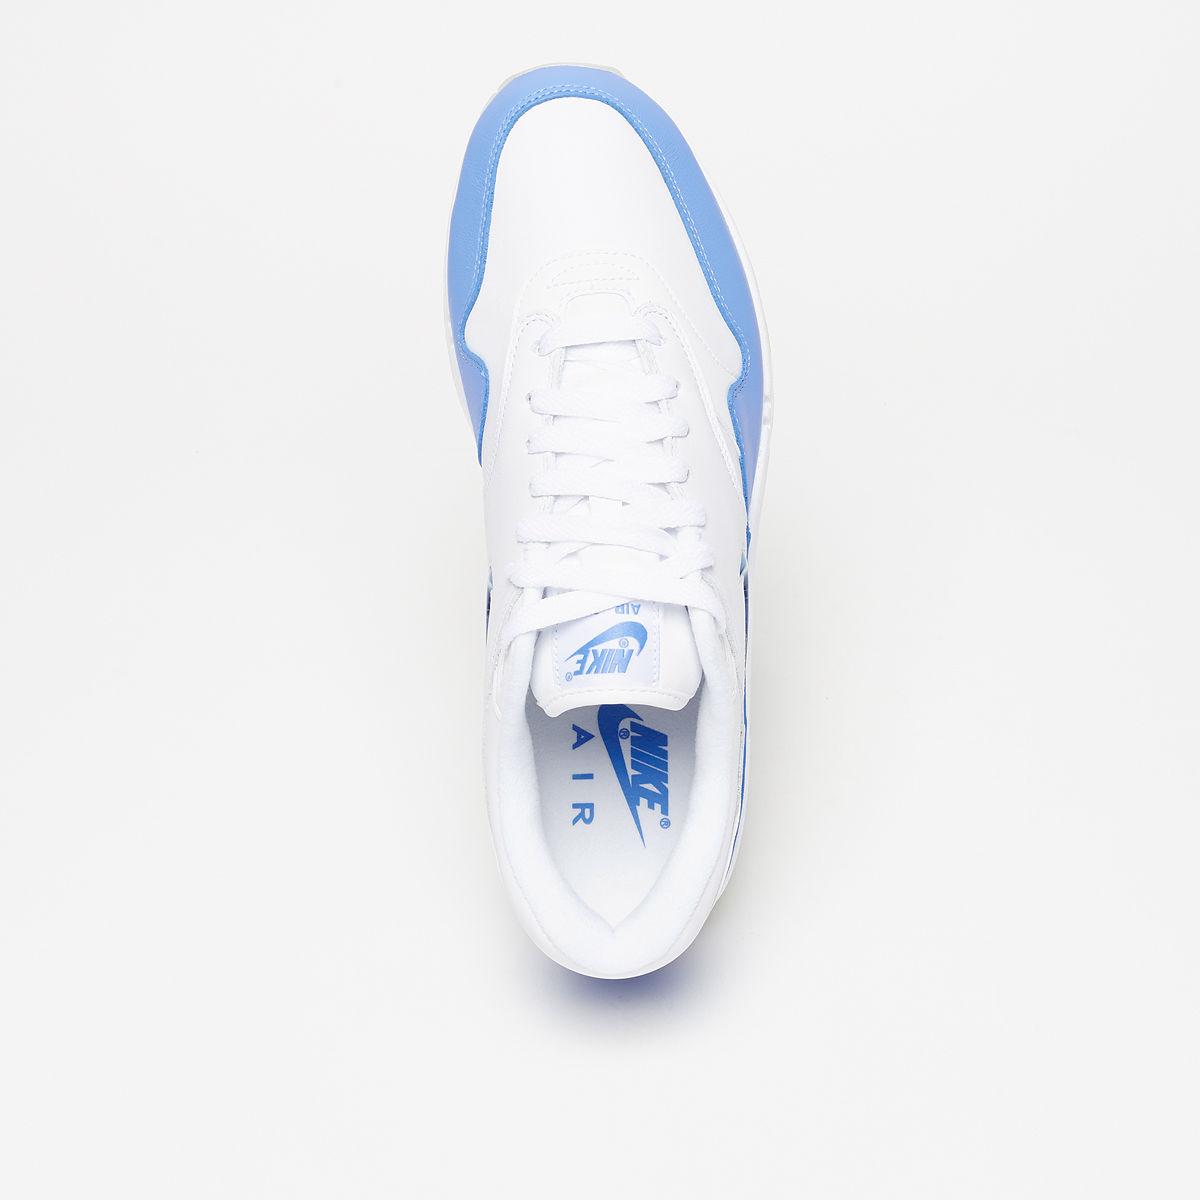 918354 004 Nike Air Max 1 Premium SC Herren Lifestyle Schuhe Grau